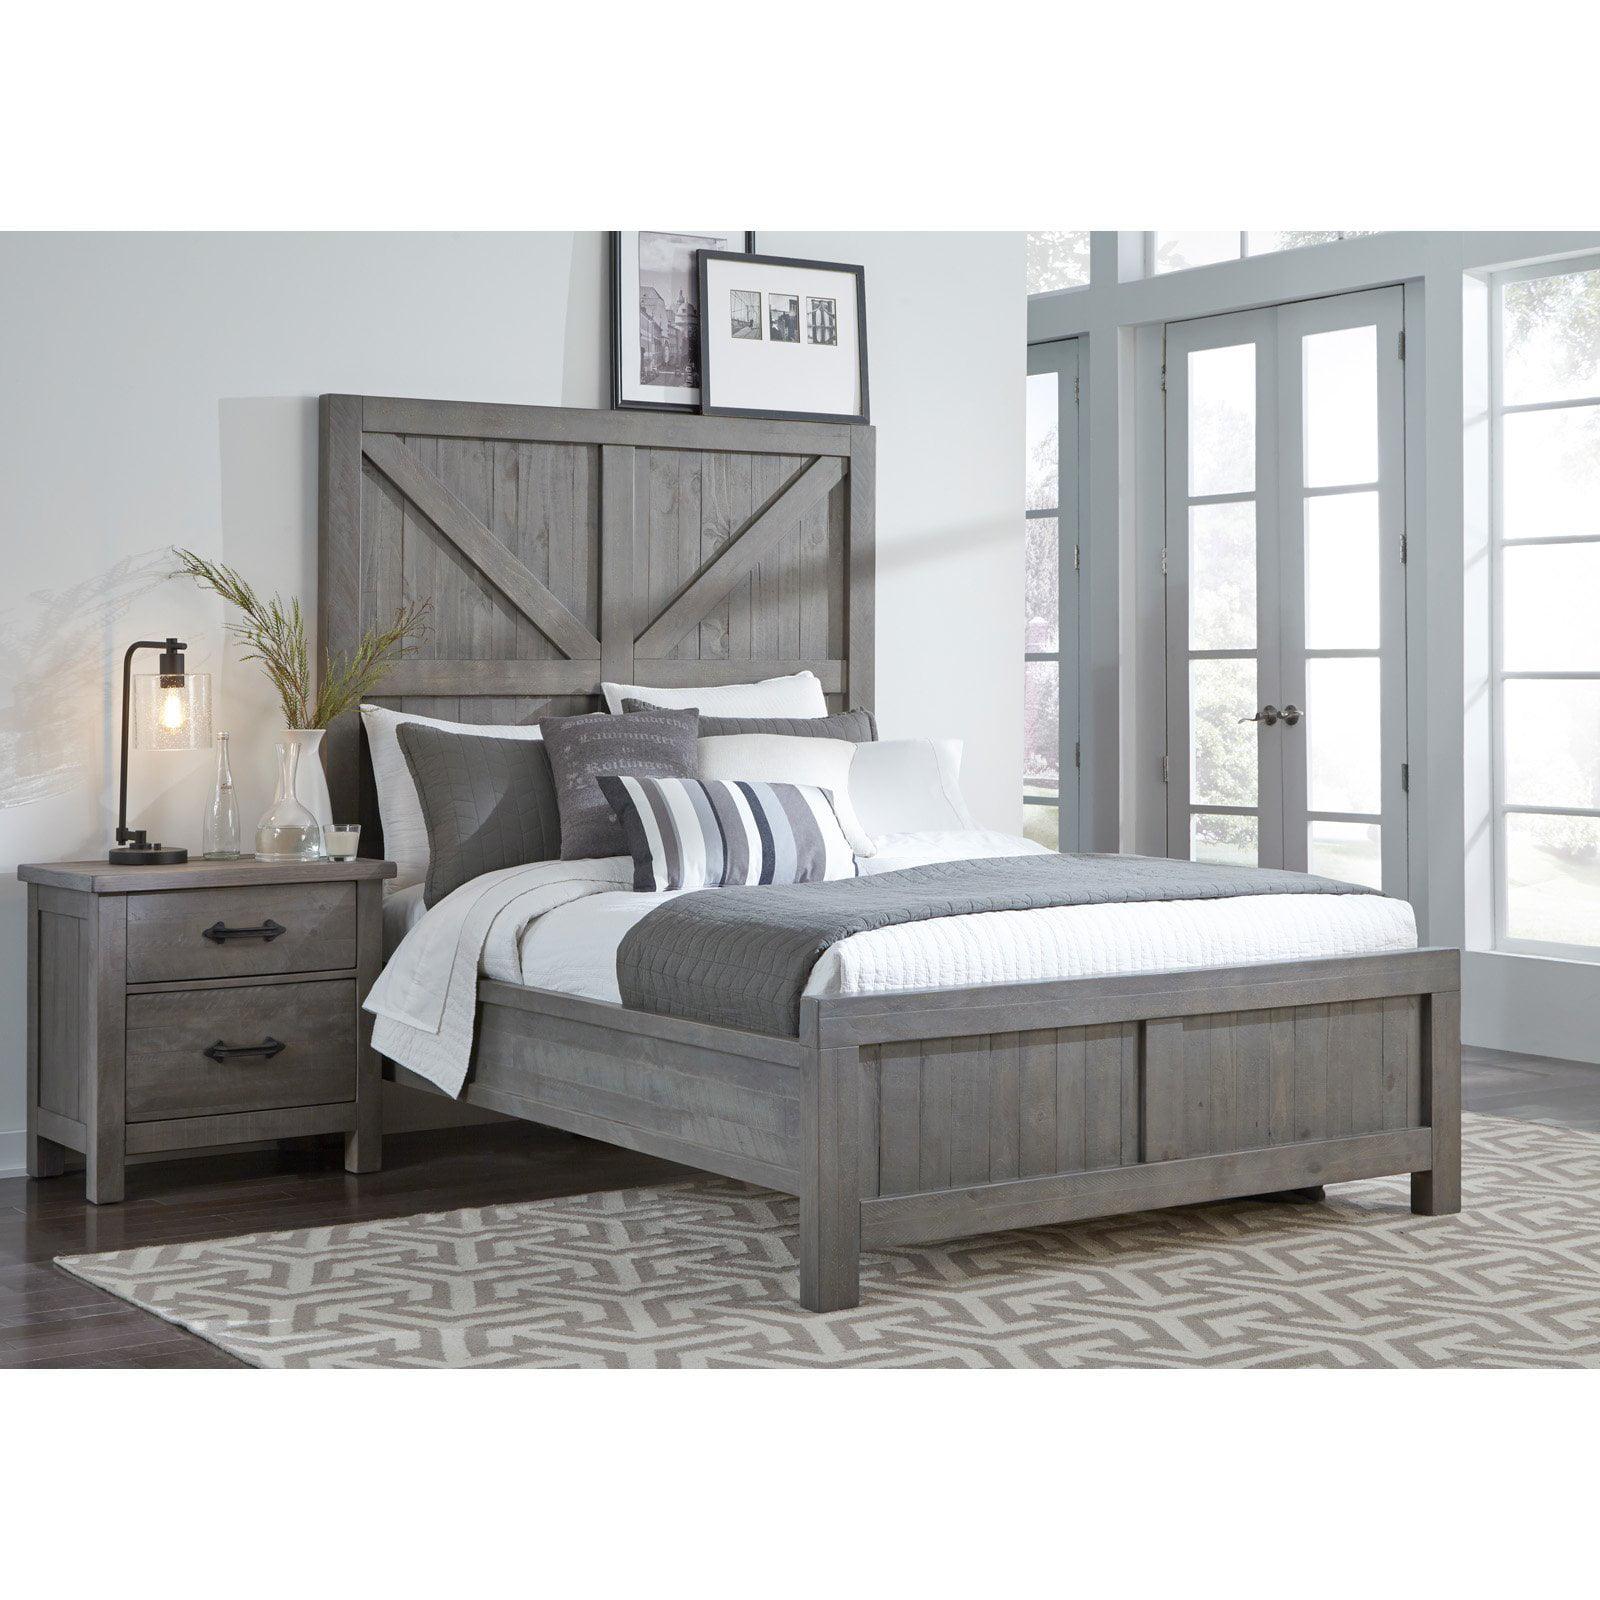 Modus Austin Barn Door Panel Bed by Modus Furniture